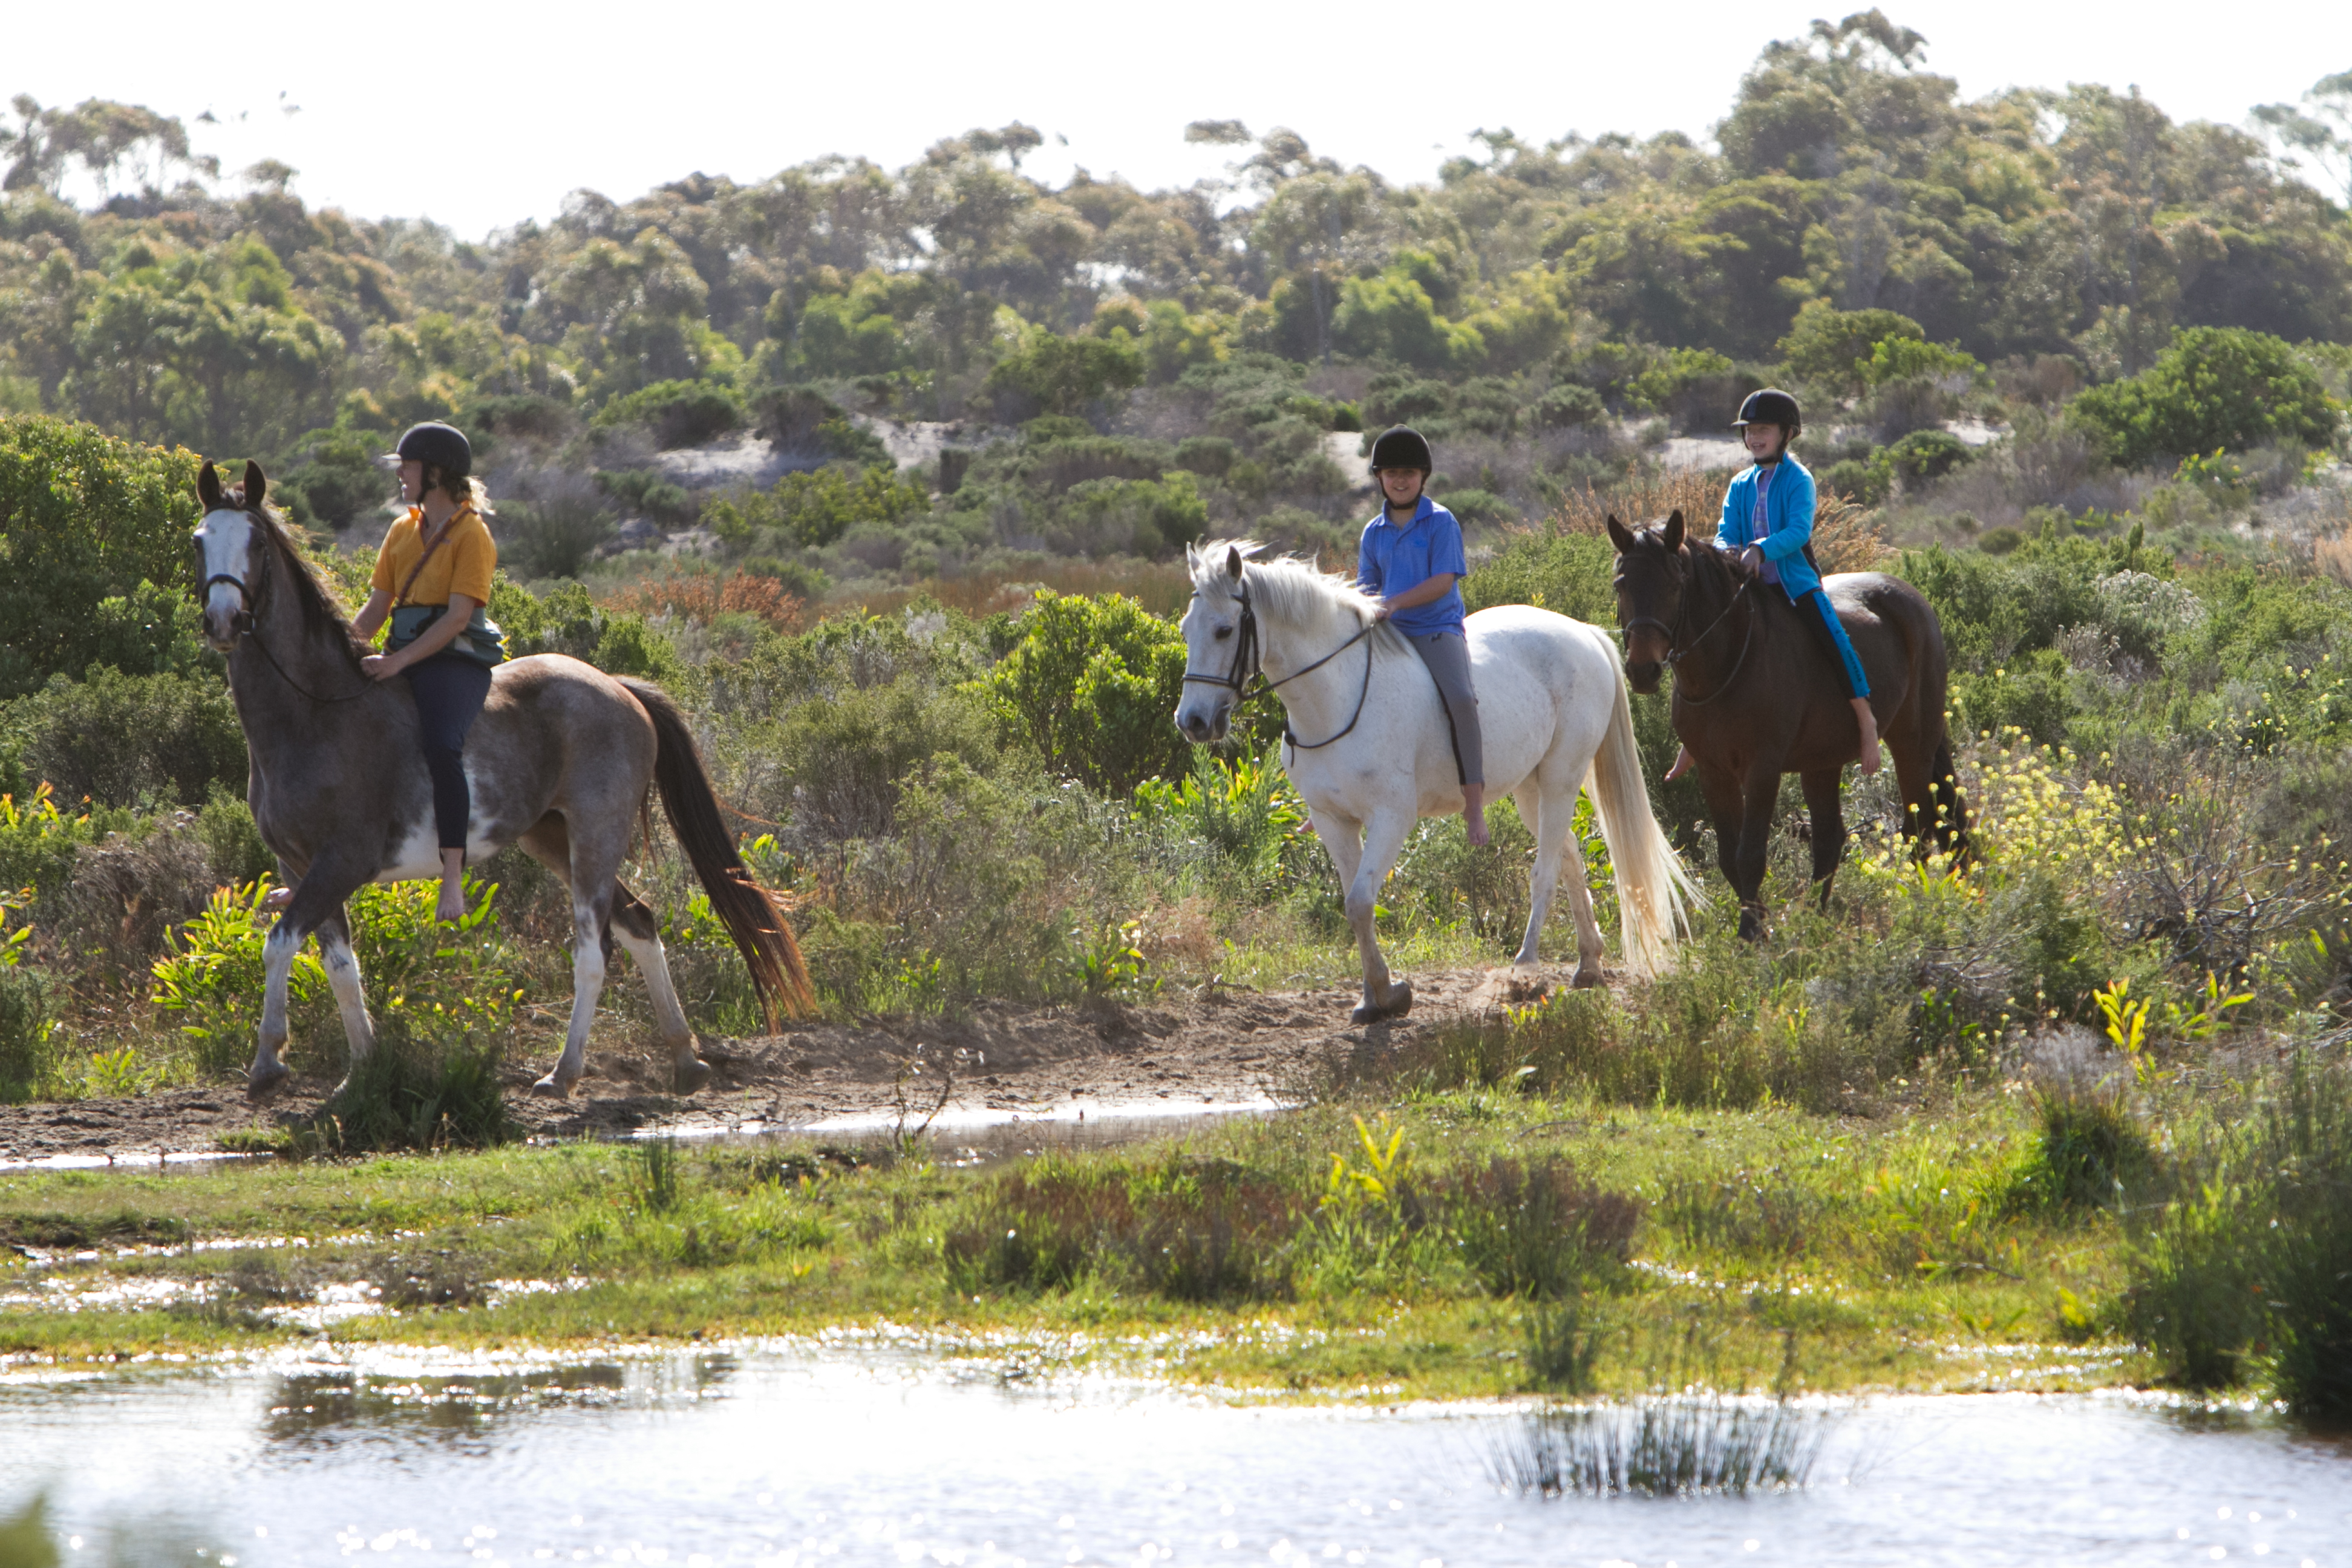 Noordhoek's horses generate more than R45million per year & create employment